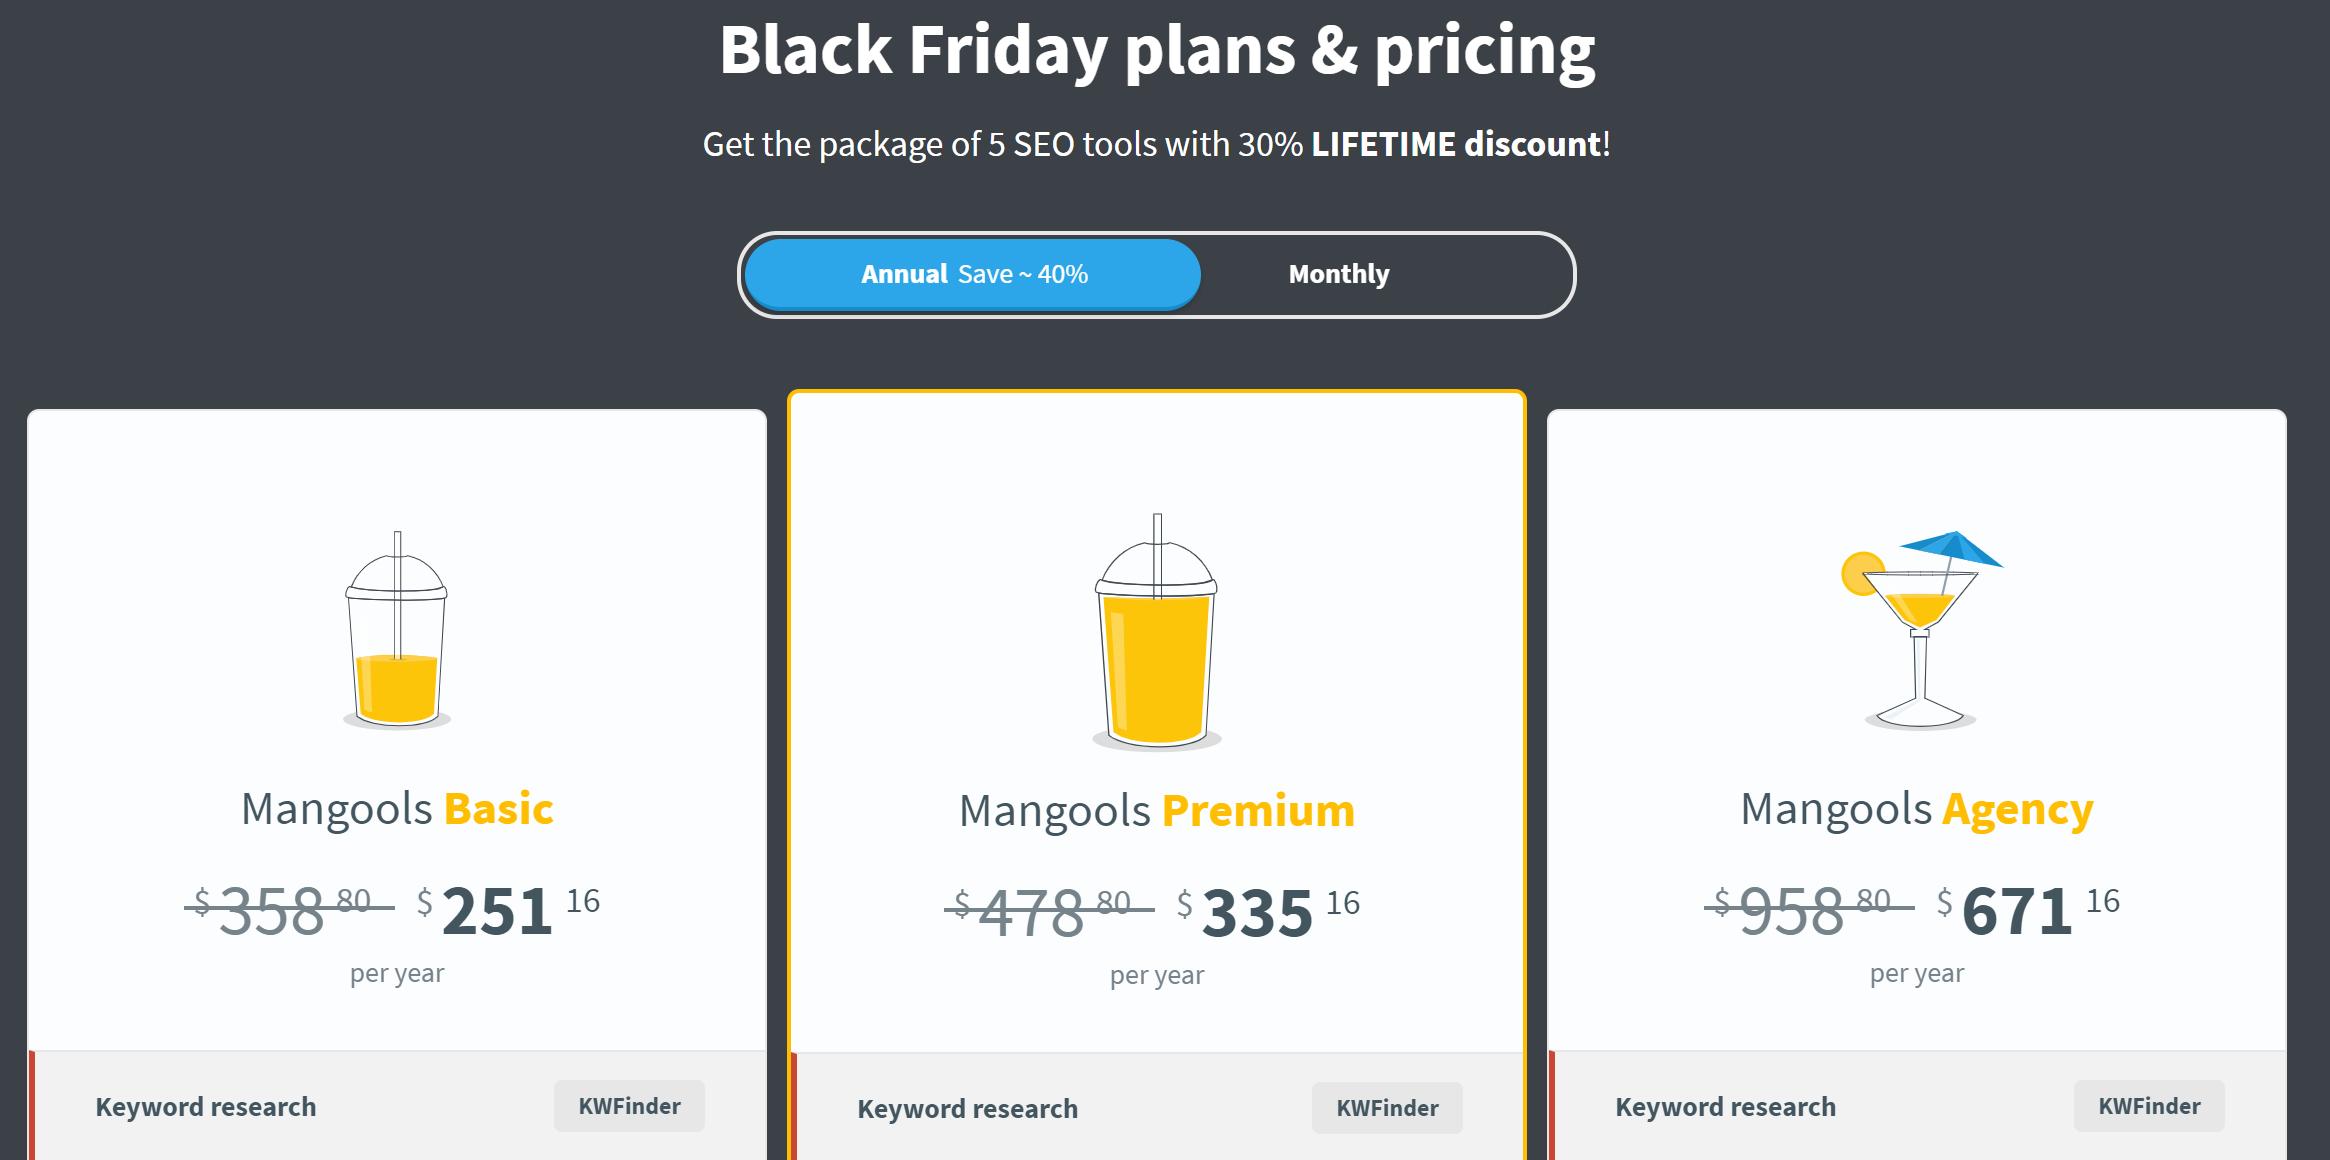 Mangools Black Friday Plans & Pricing